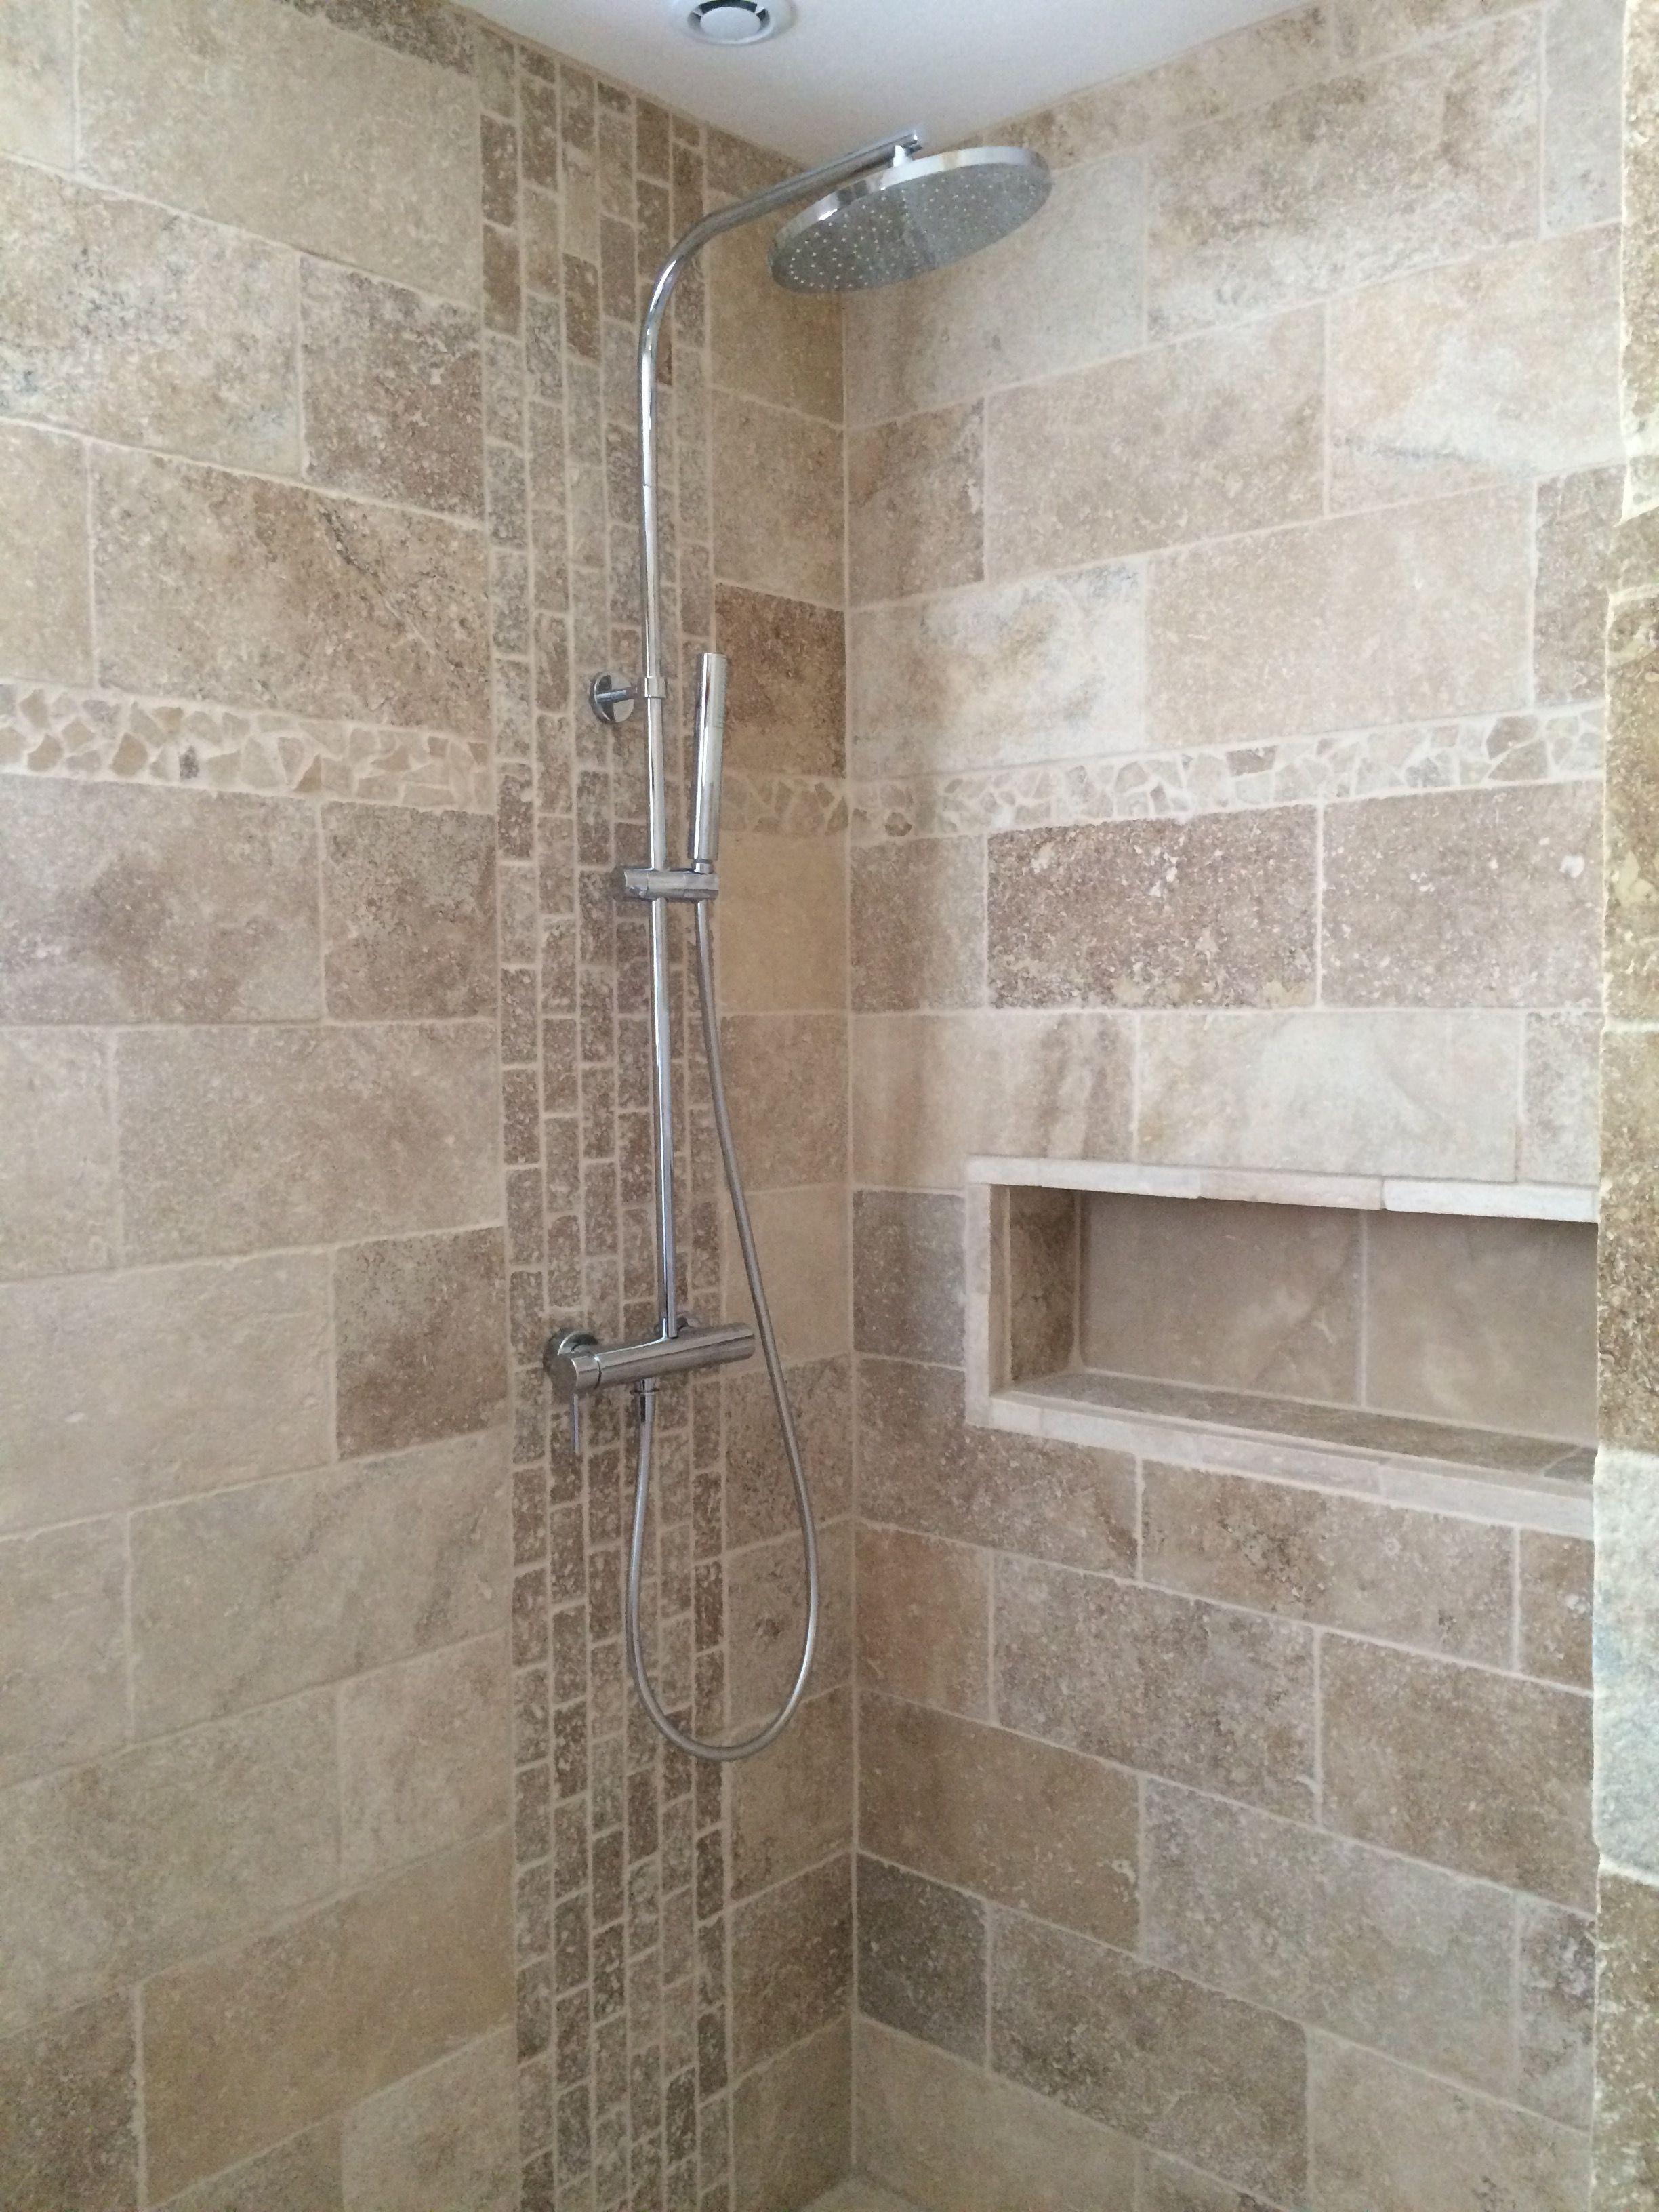 Salle de bain travertin douche italienne niche | Salle de bain ...